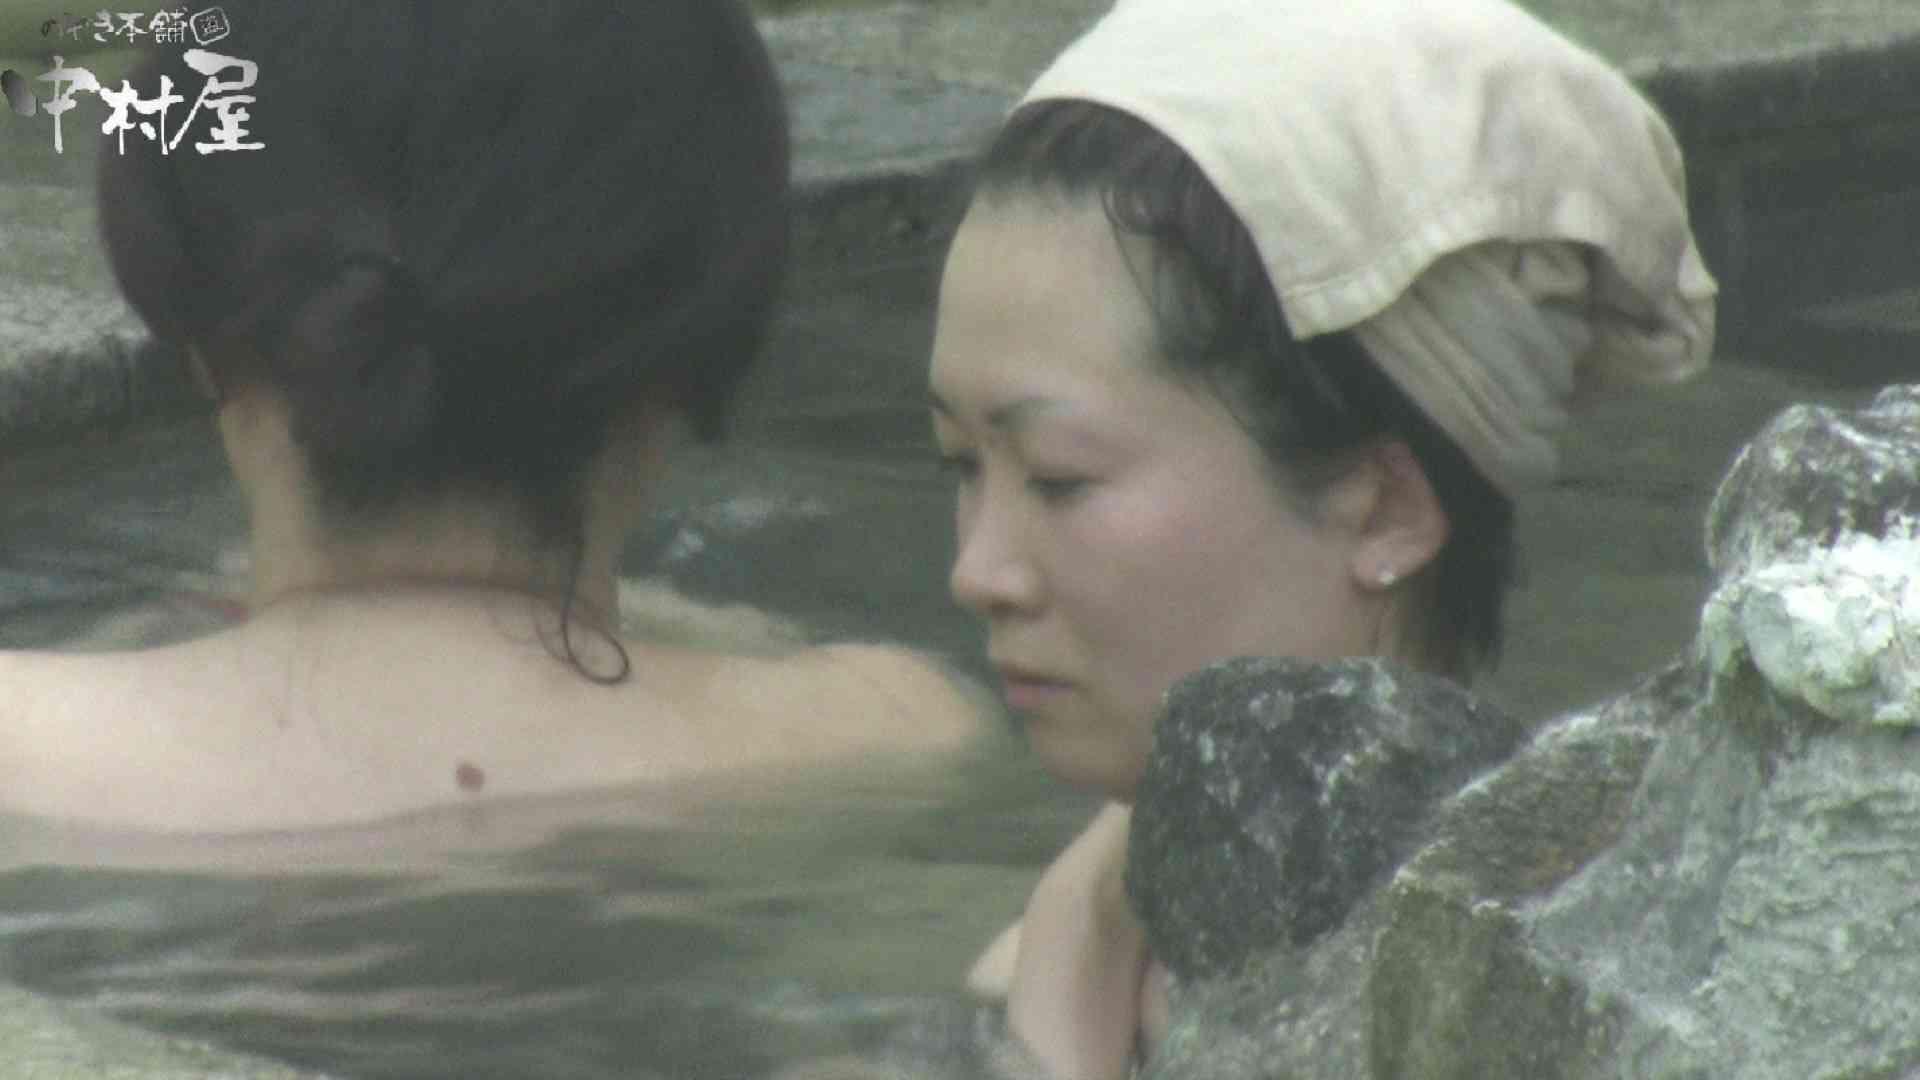 Aquaな露天風呂Vol.906 露天風呂編 | 盗撮シリーズ  86PIX 7